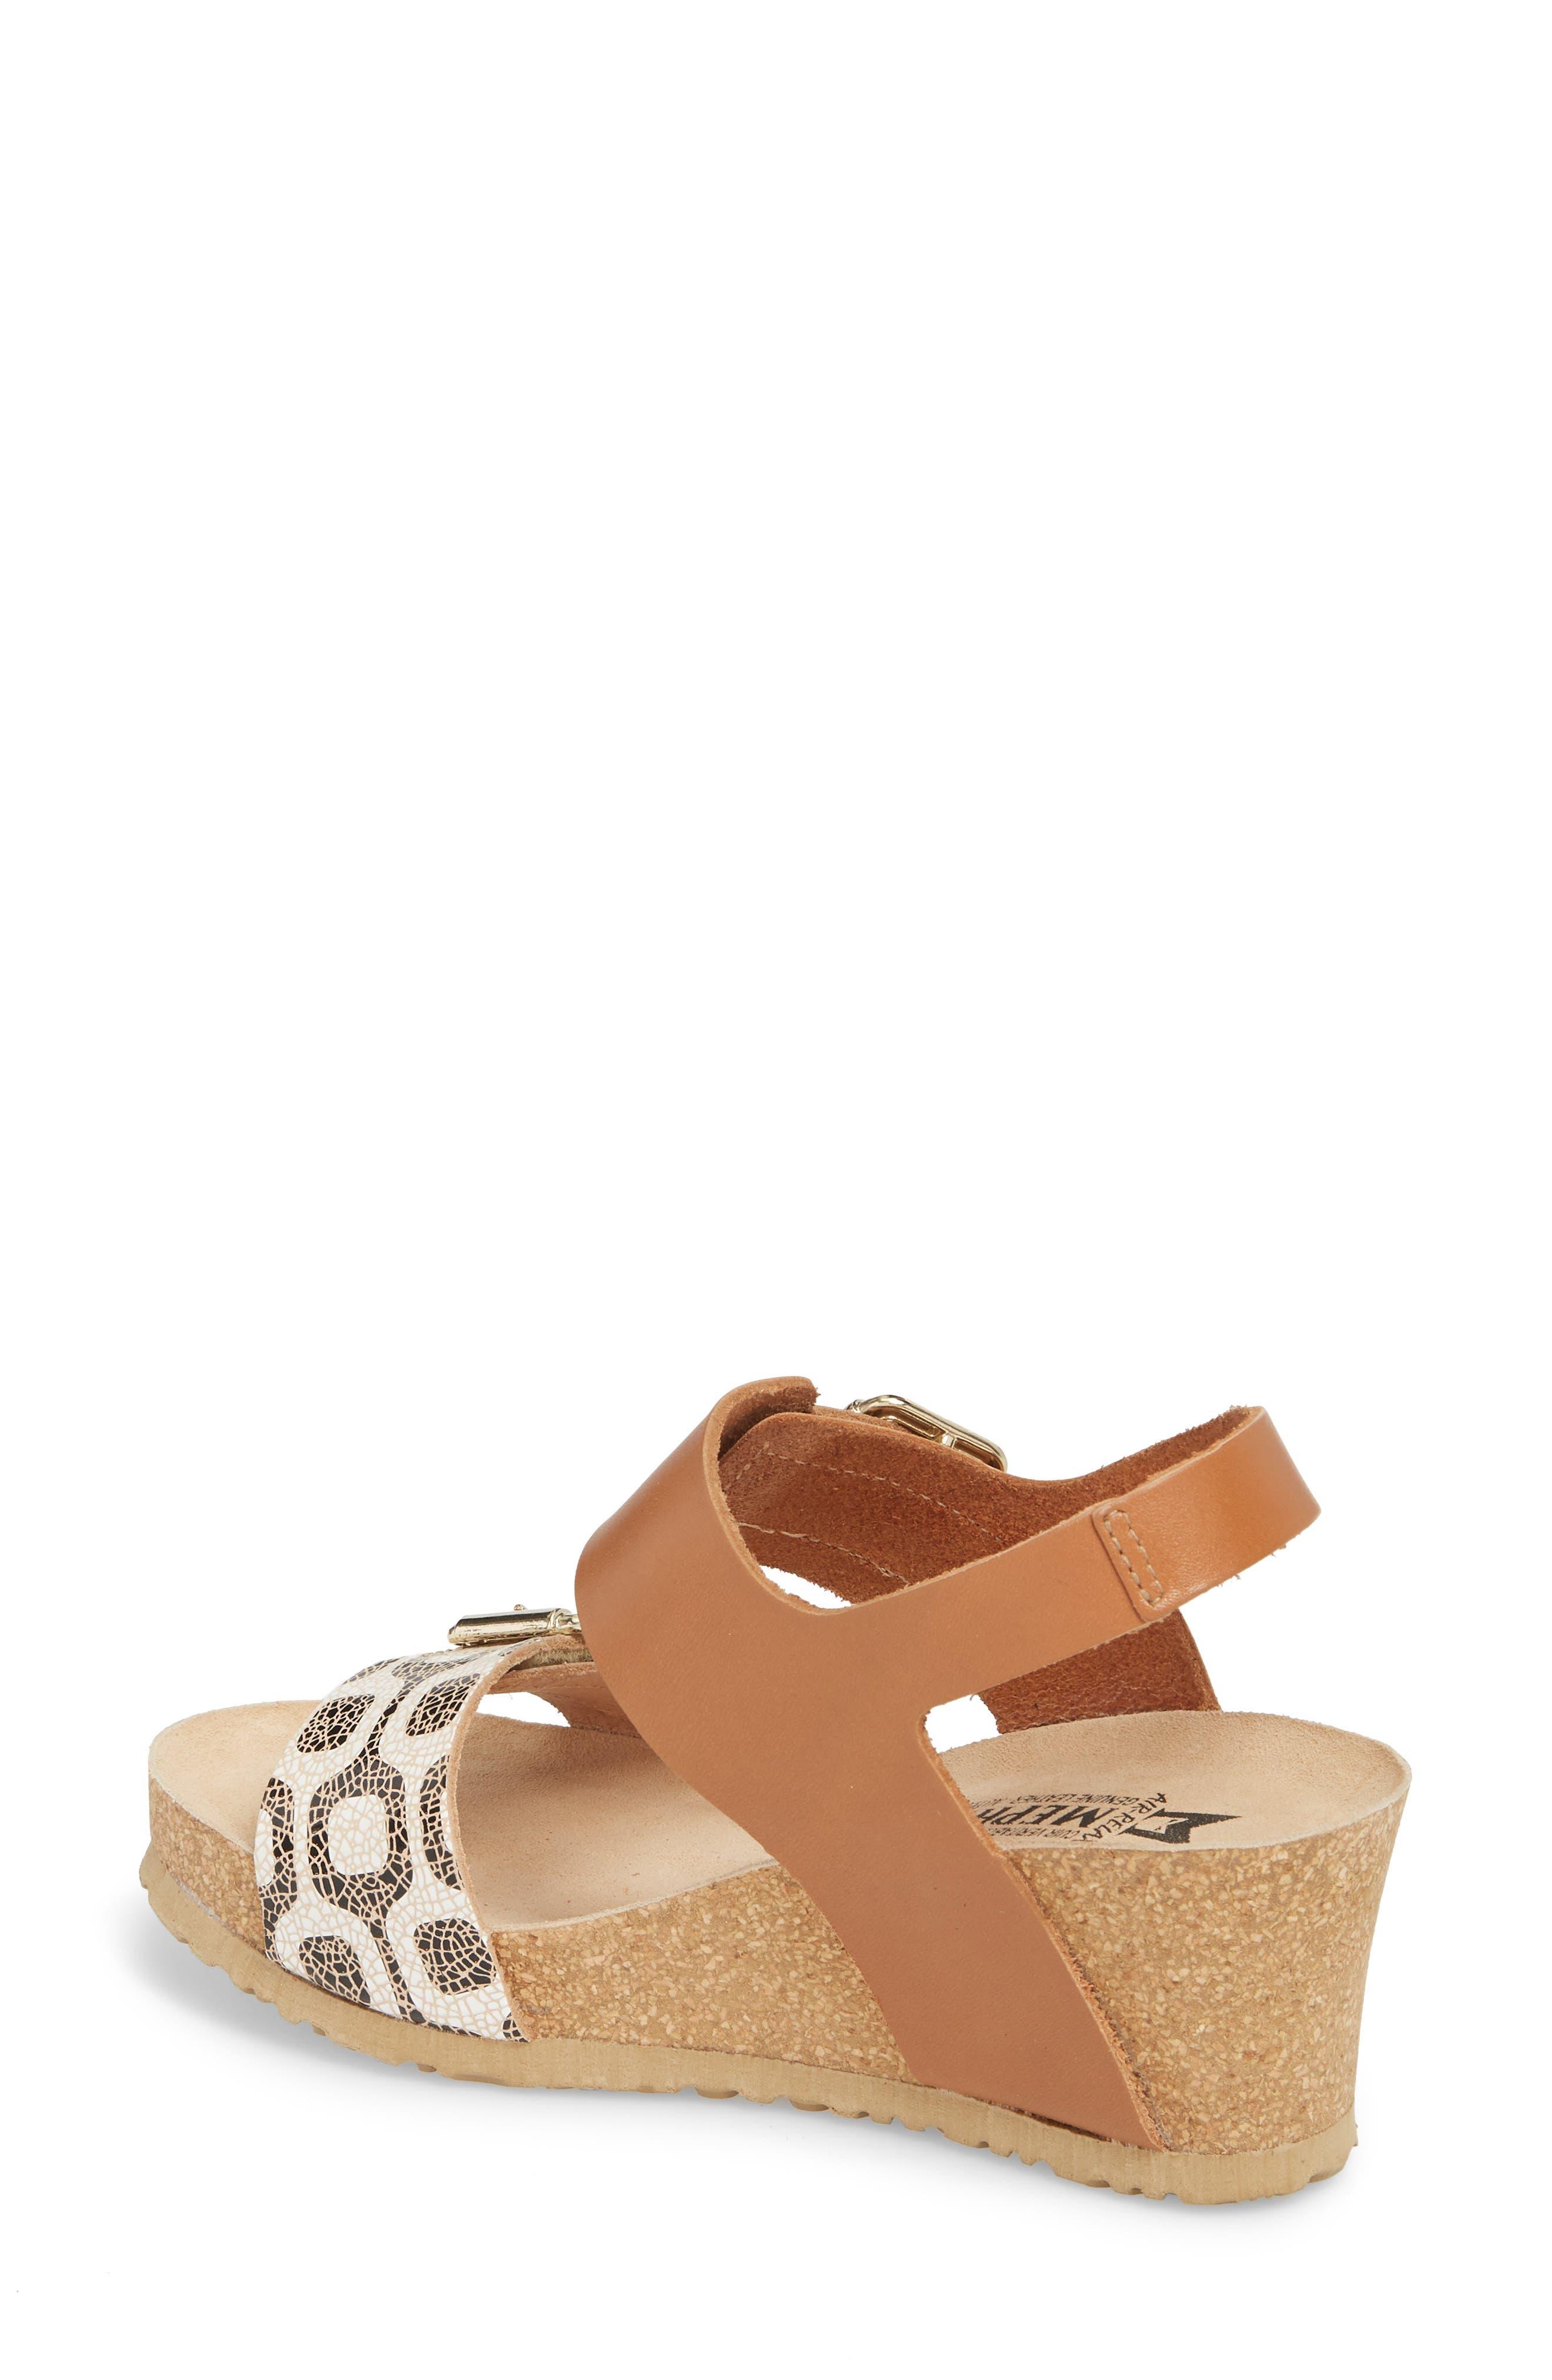 Lissandra Platform Wedge Sandal,                             Alternate thumbnail 2, color,                             Camel